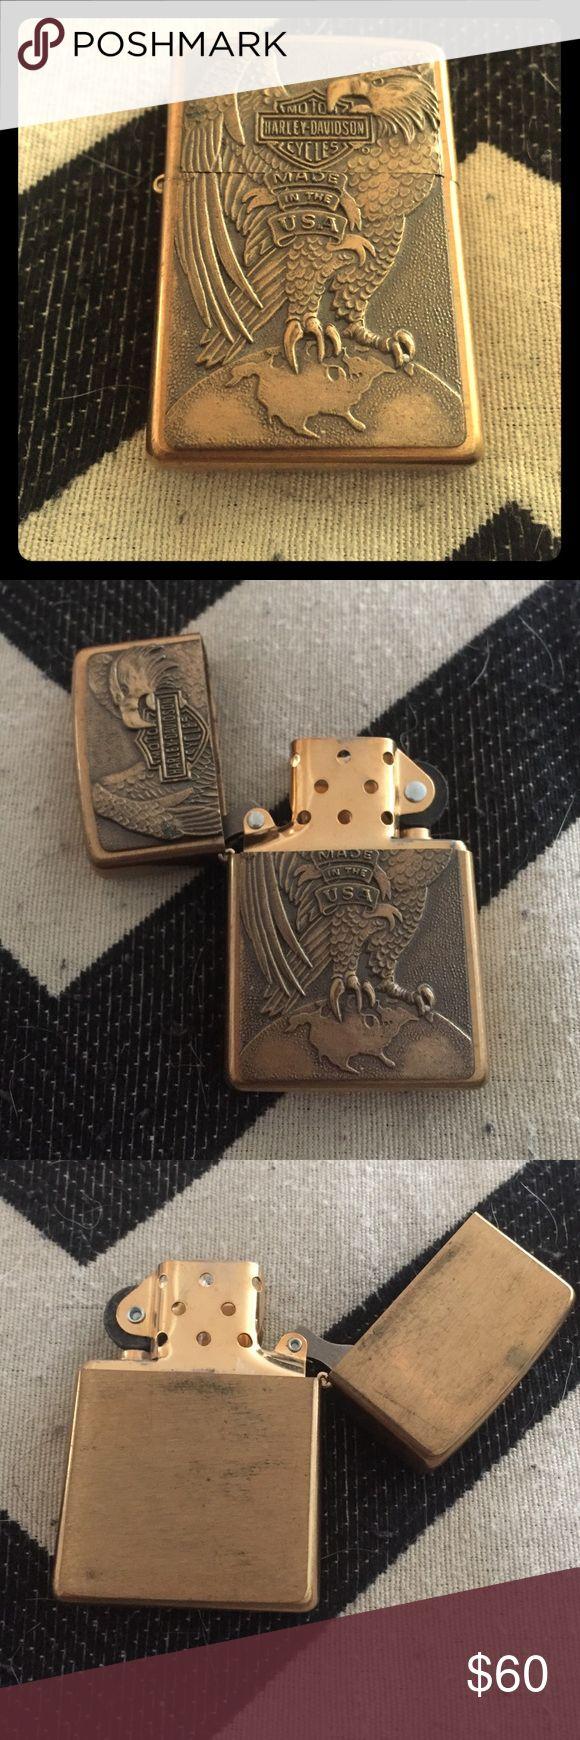 Harley Davidson Zippo Lighter Eagle Crest Zippo Lighter. Eagle is standing on the world. Vintage gold coloring. Harley-Davidson Accessories